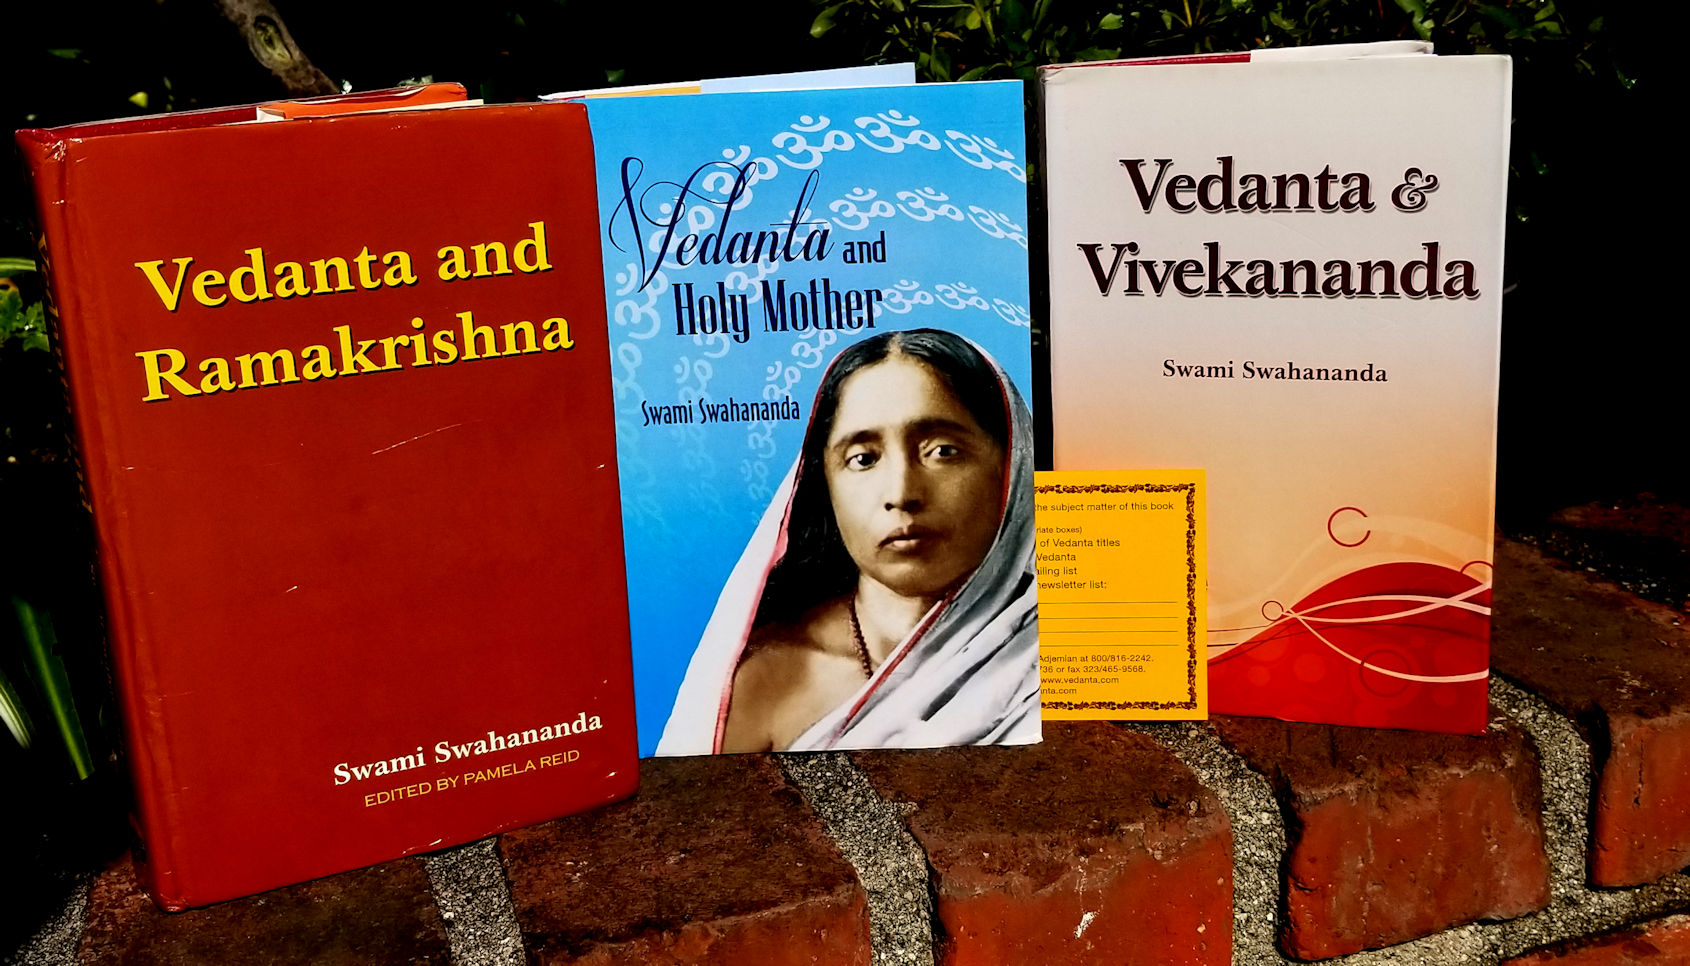 3-Book Set of Swami Swahananda's Works